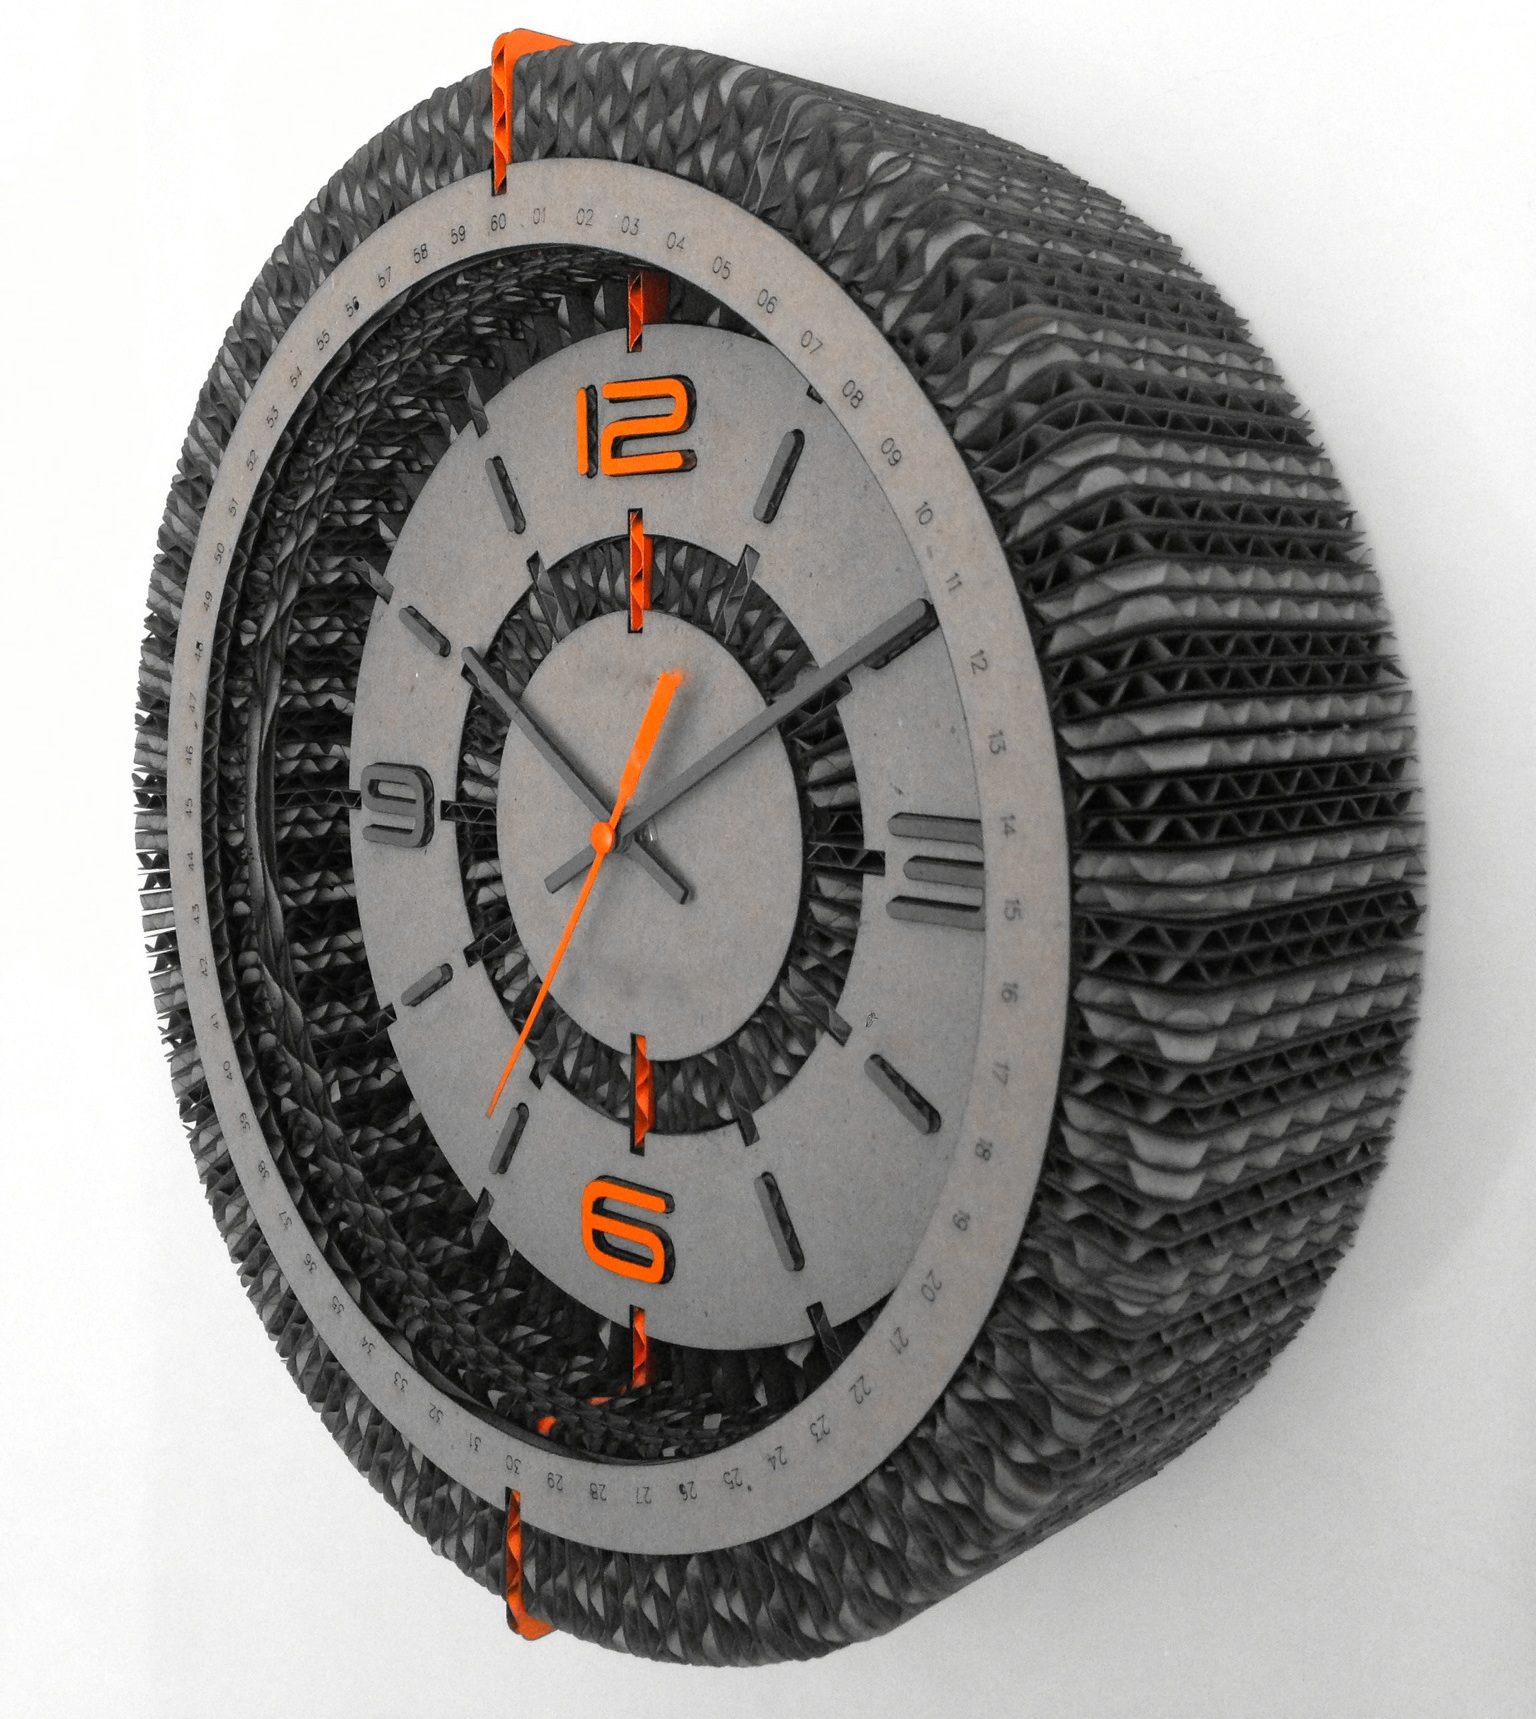 SWC-1 Cardboard Wall Clock